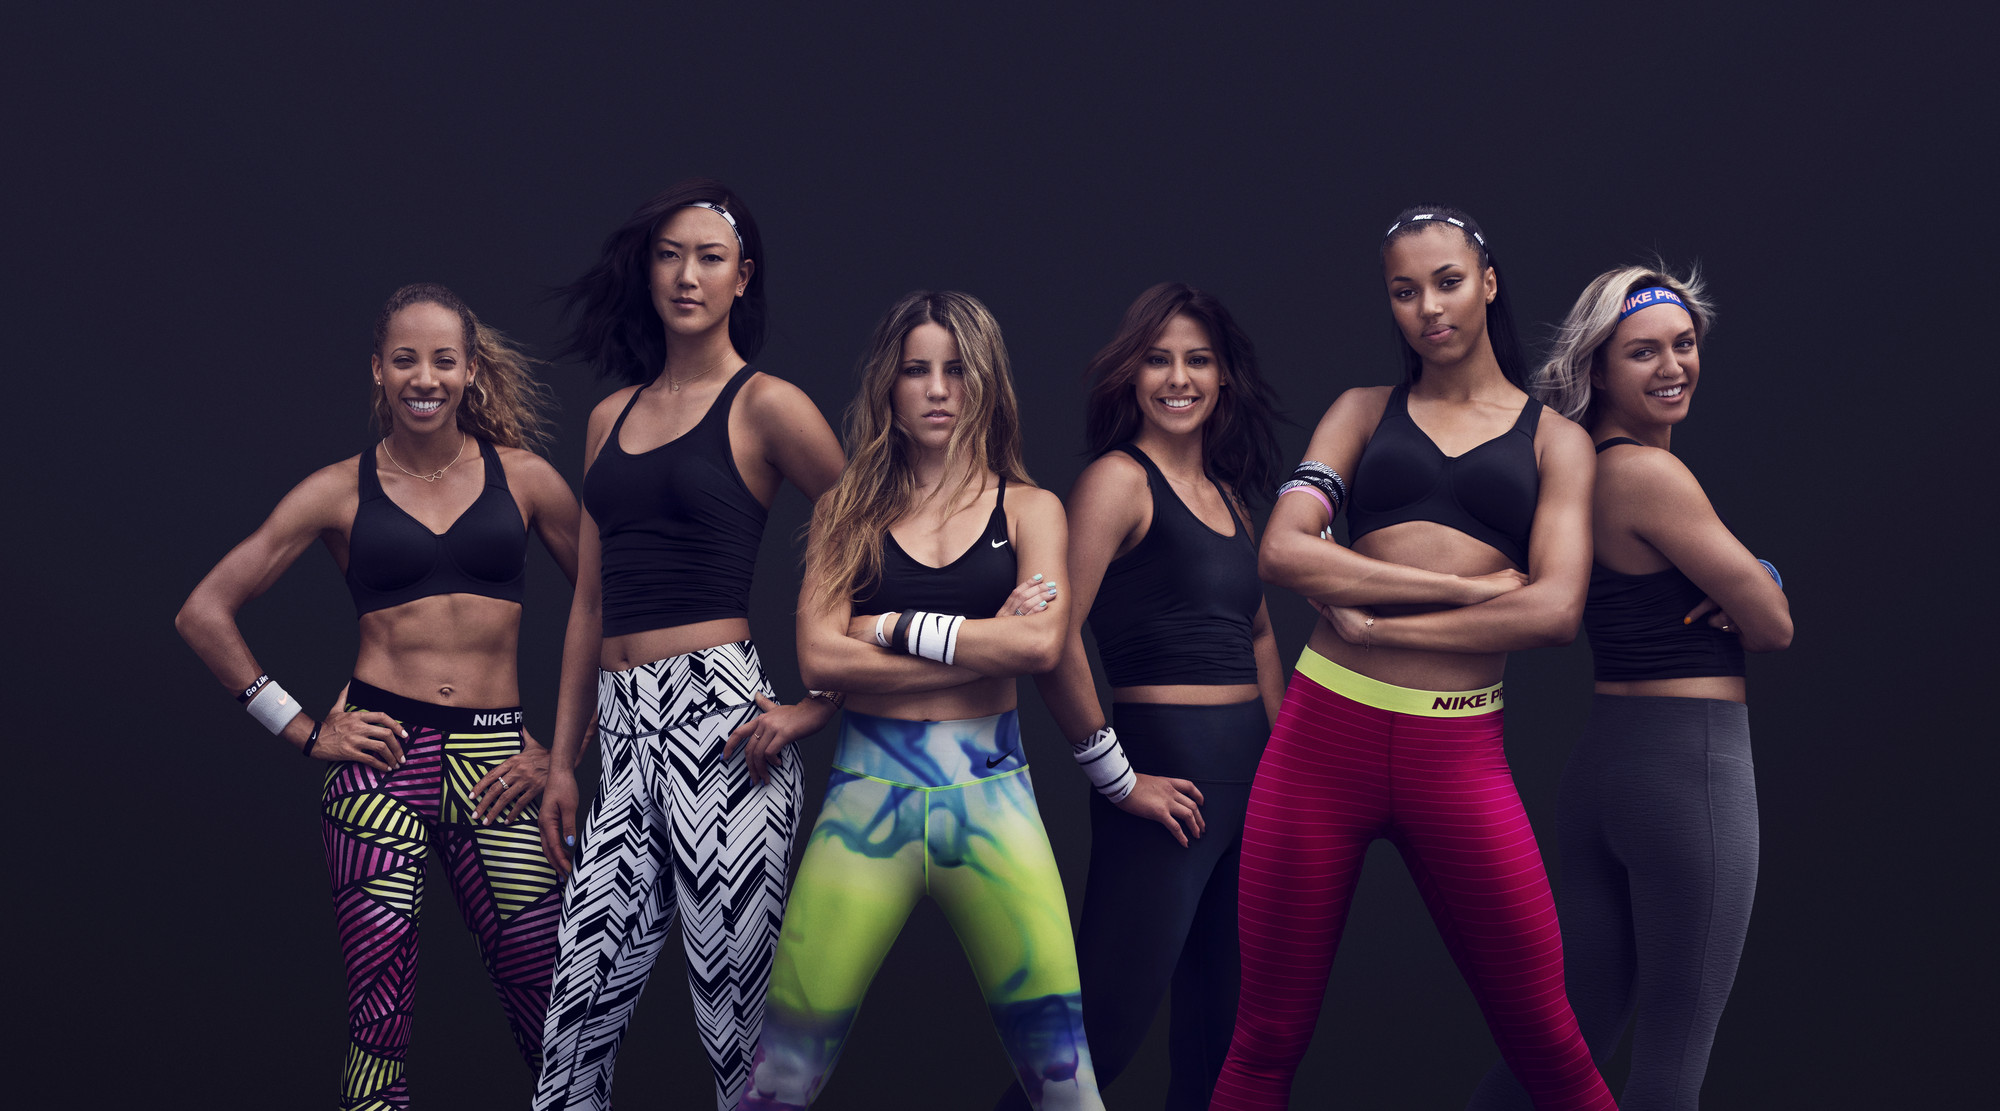 Lea Wallace, Michelle Wie, Leticia Bufoni, Marlen Esparza, Morgan Lake